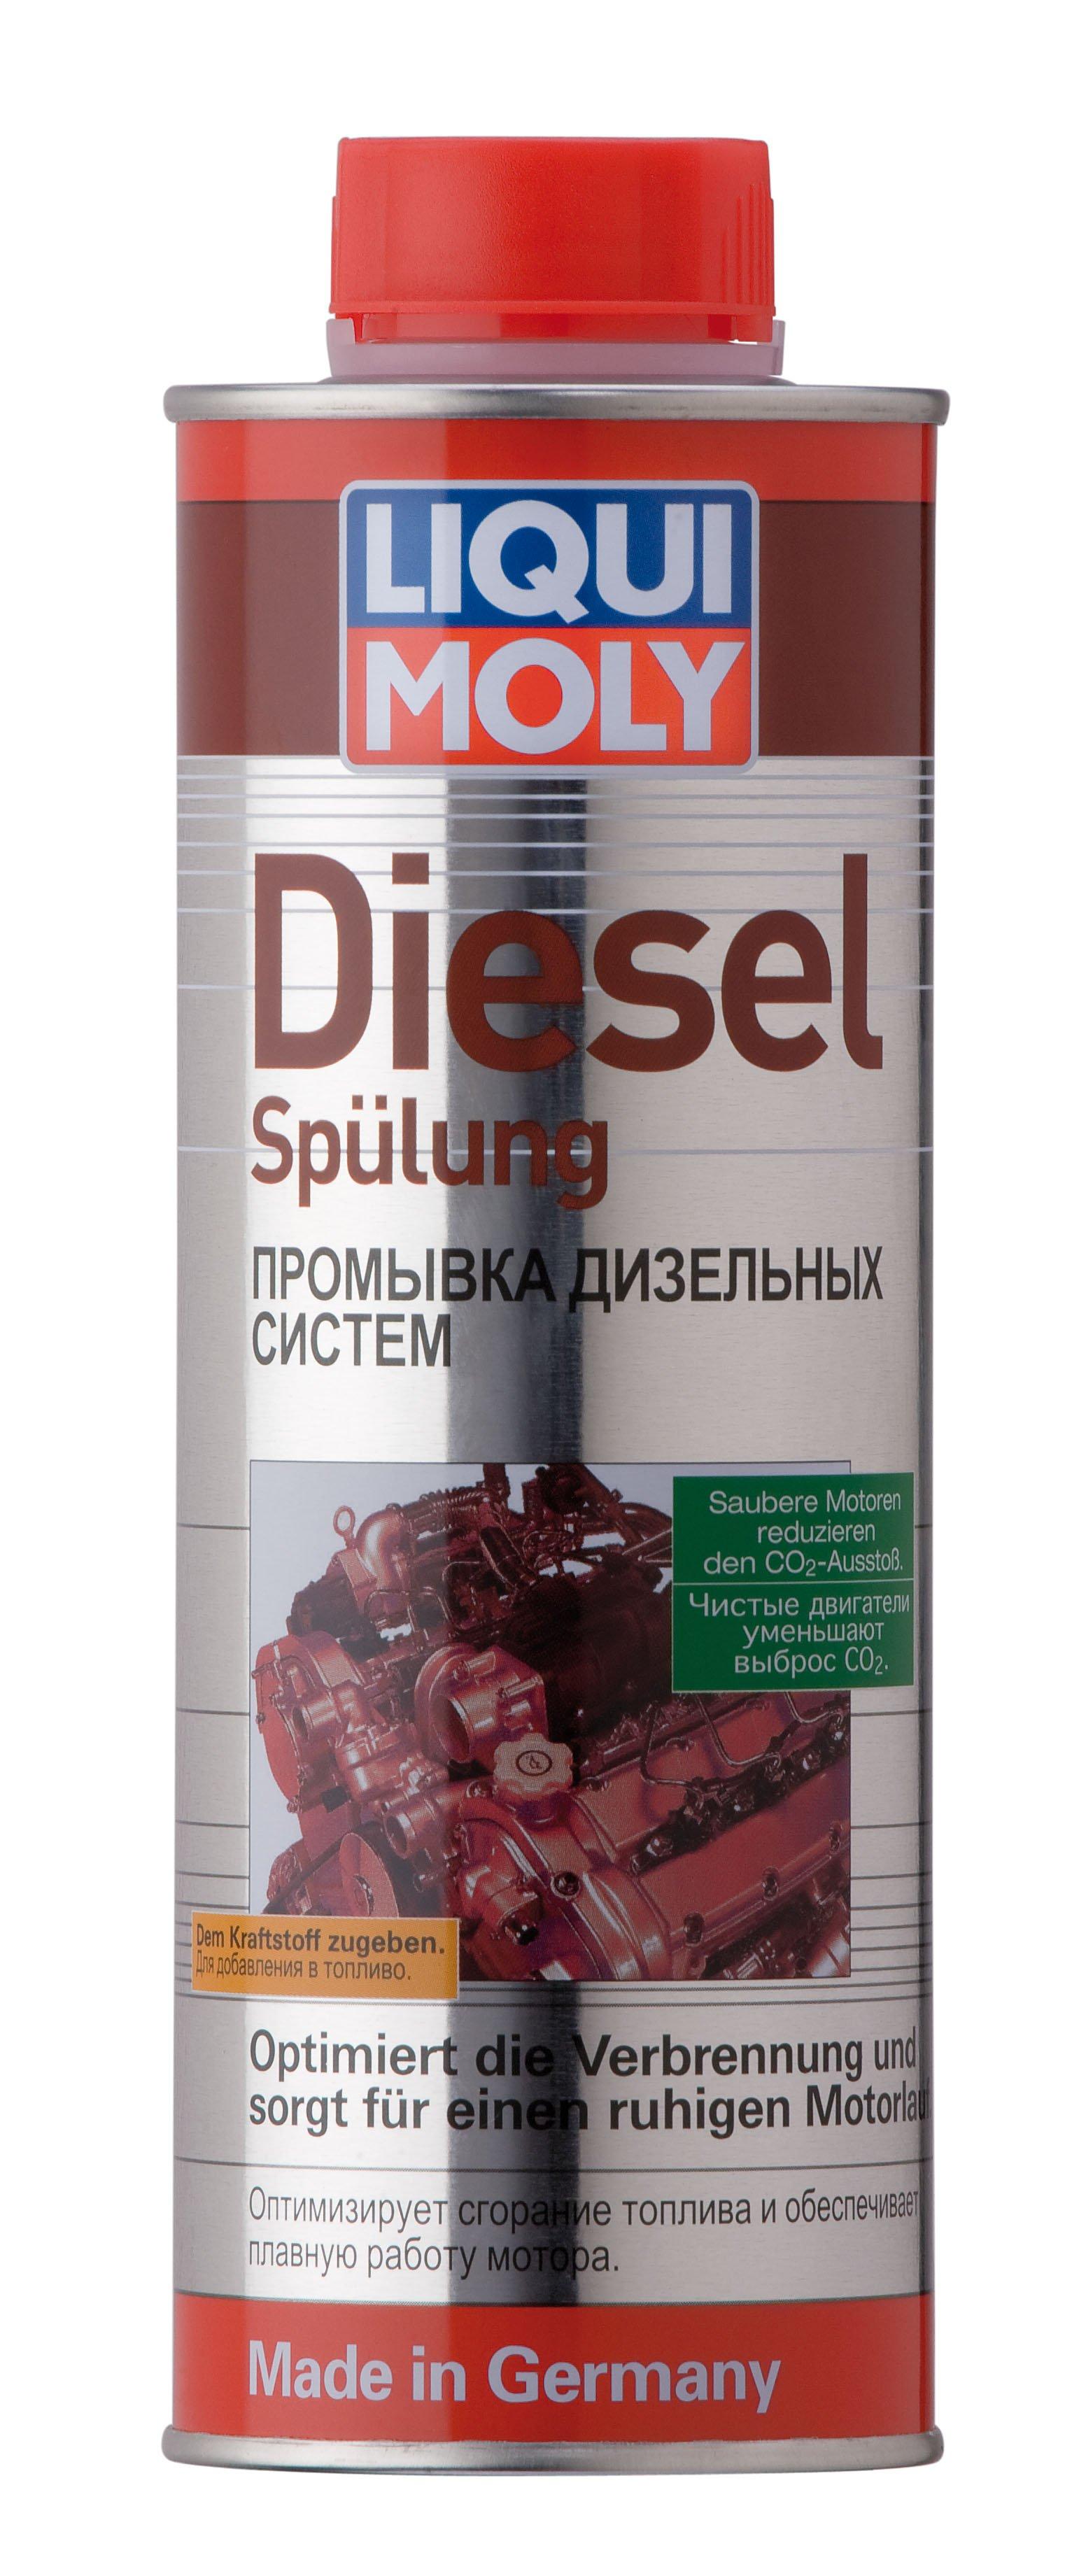 Liqui Moly Diesel-Spulung